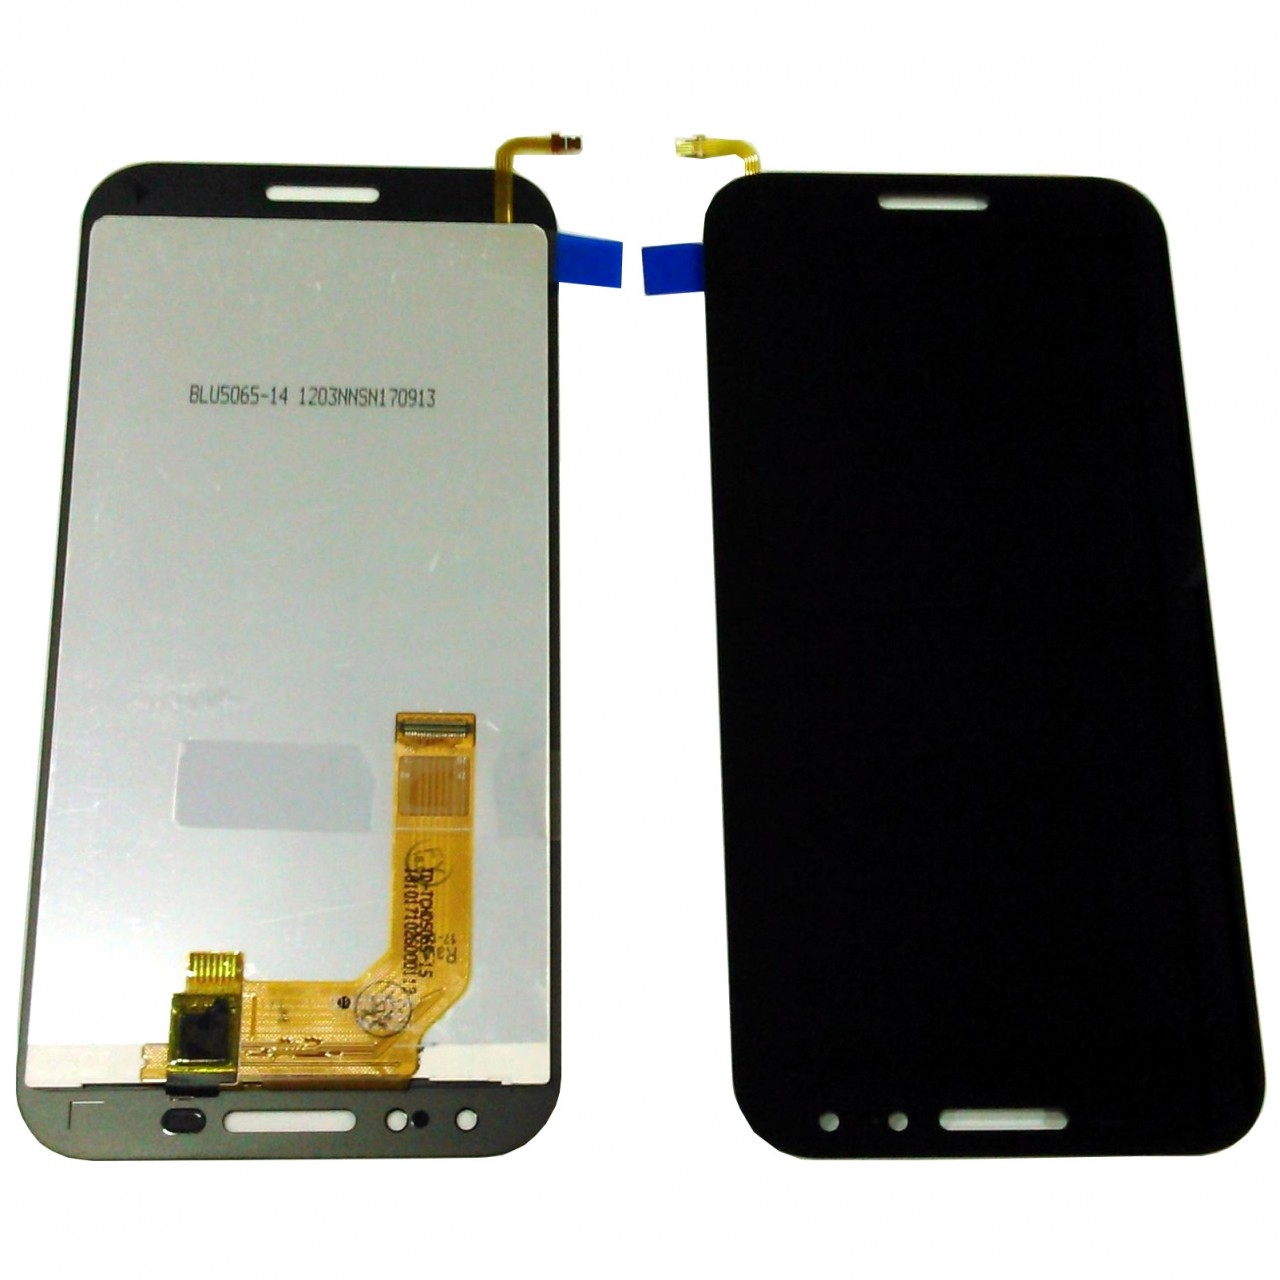 Display Vodafone Smart N8 VFD 610 imagine powerlaptop.ro 2021